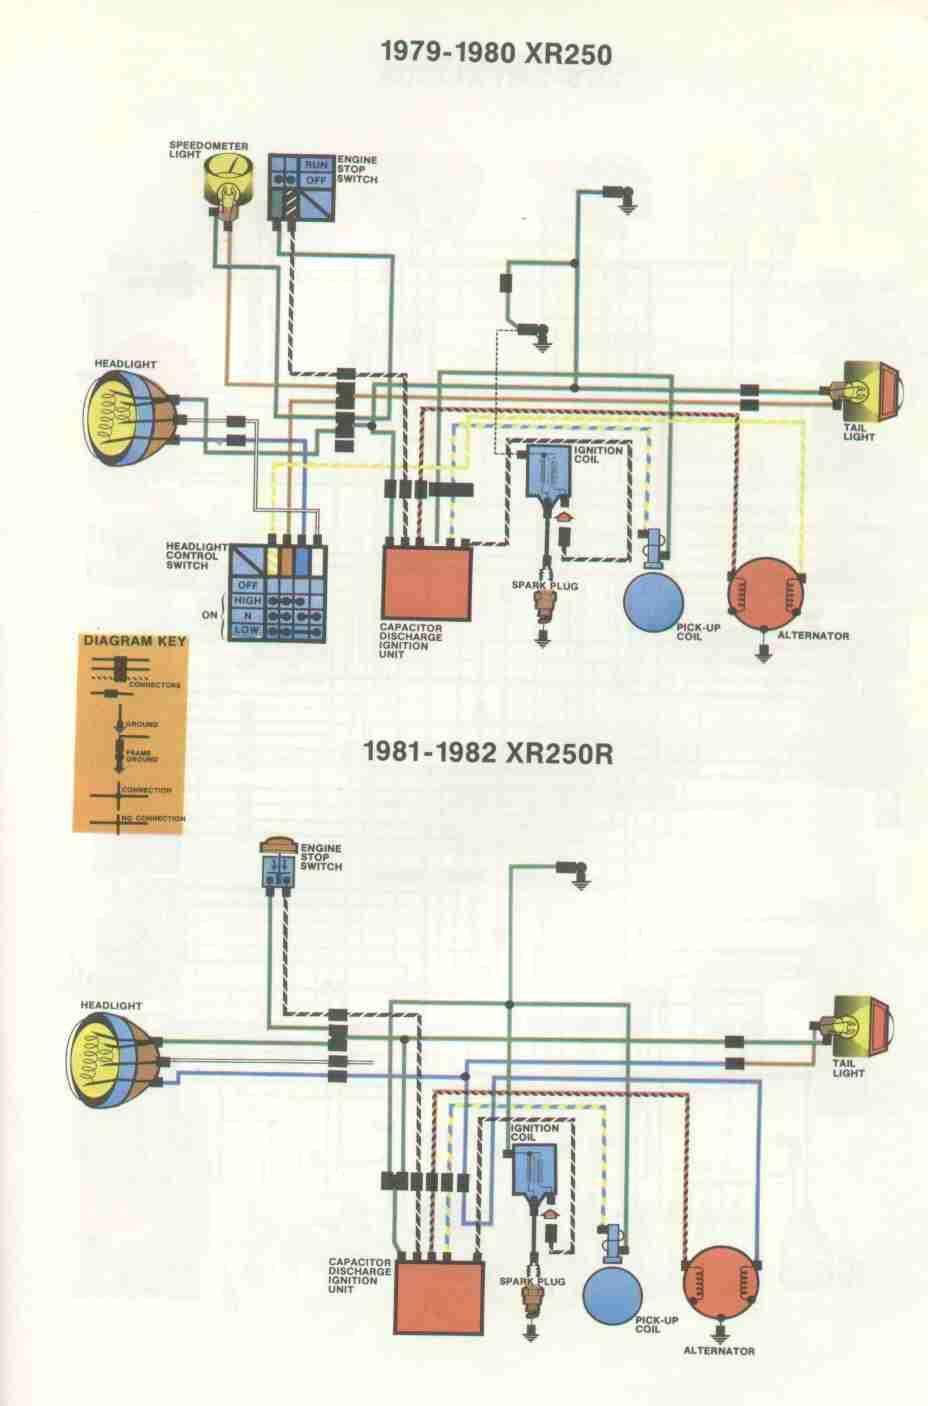 ZX_9486] Honda Xr200 Wiring Diagram Wiring DiagramExpe Lave Itis Mohammedshrine Librar Wiring 101